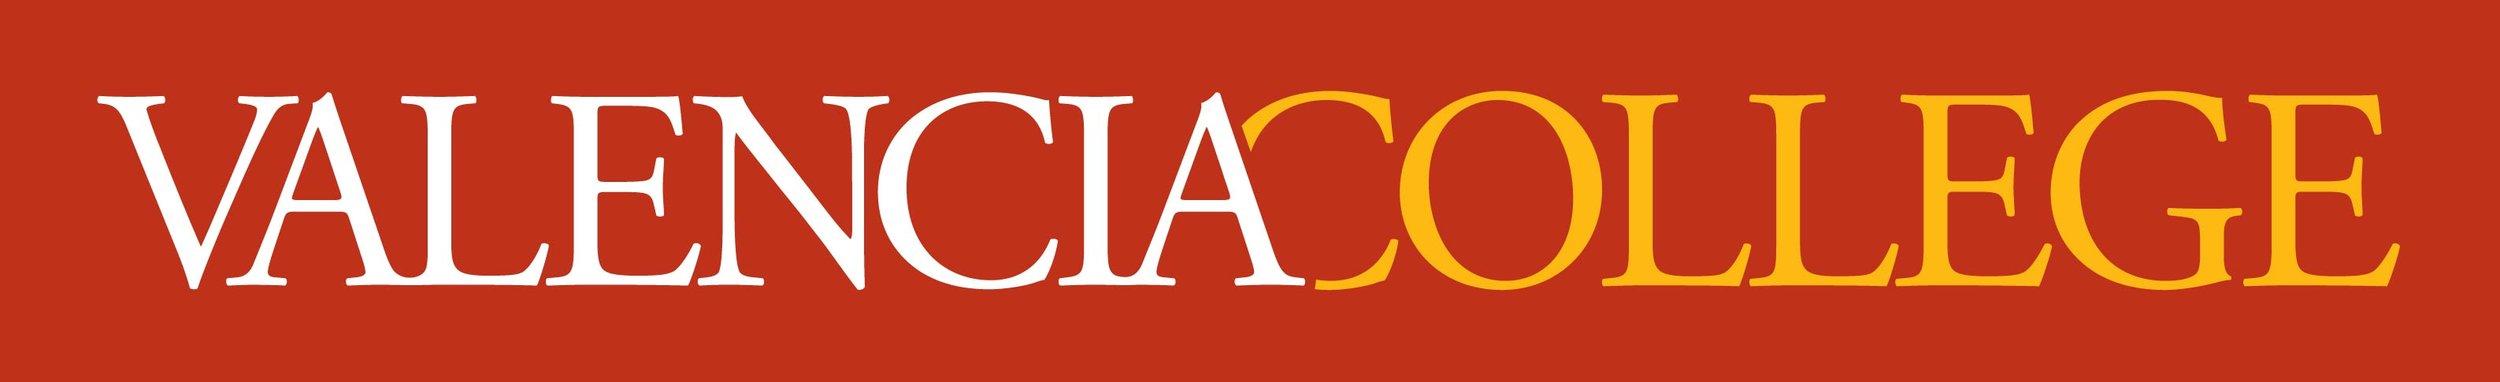 vc-logo-web-box-rev.jpg